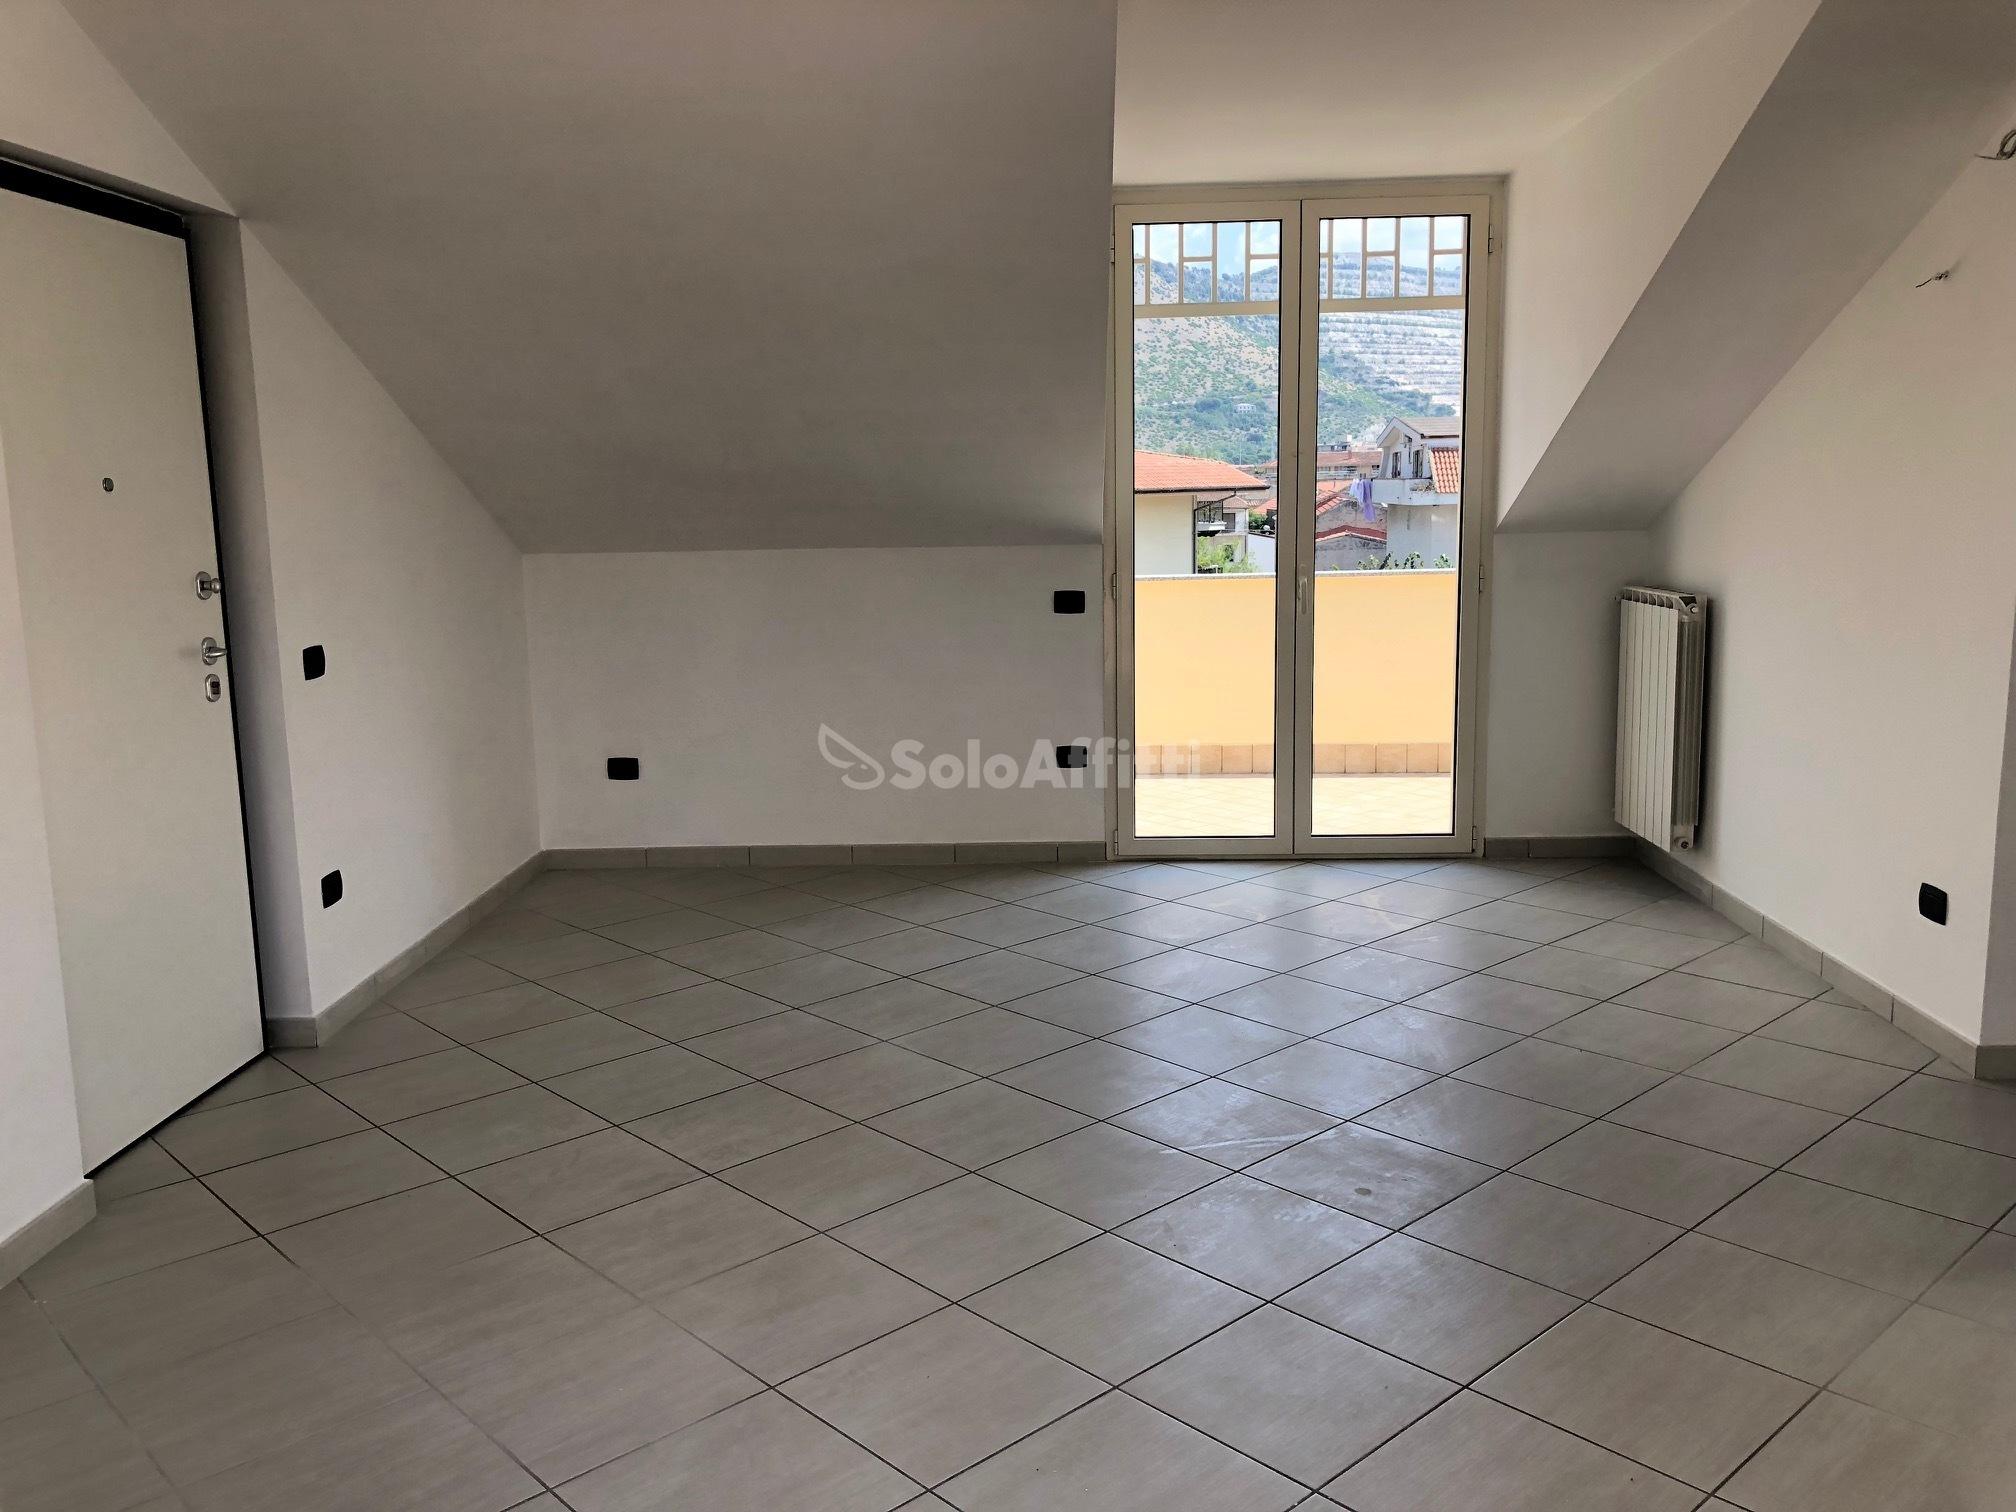 Appartamento Mansarda 70 mq.